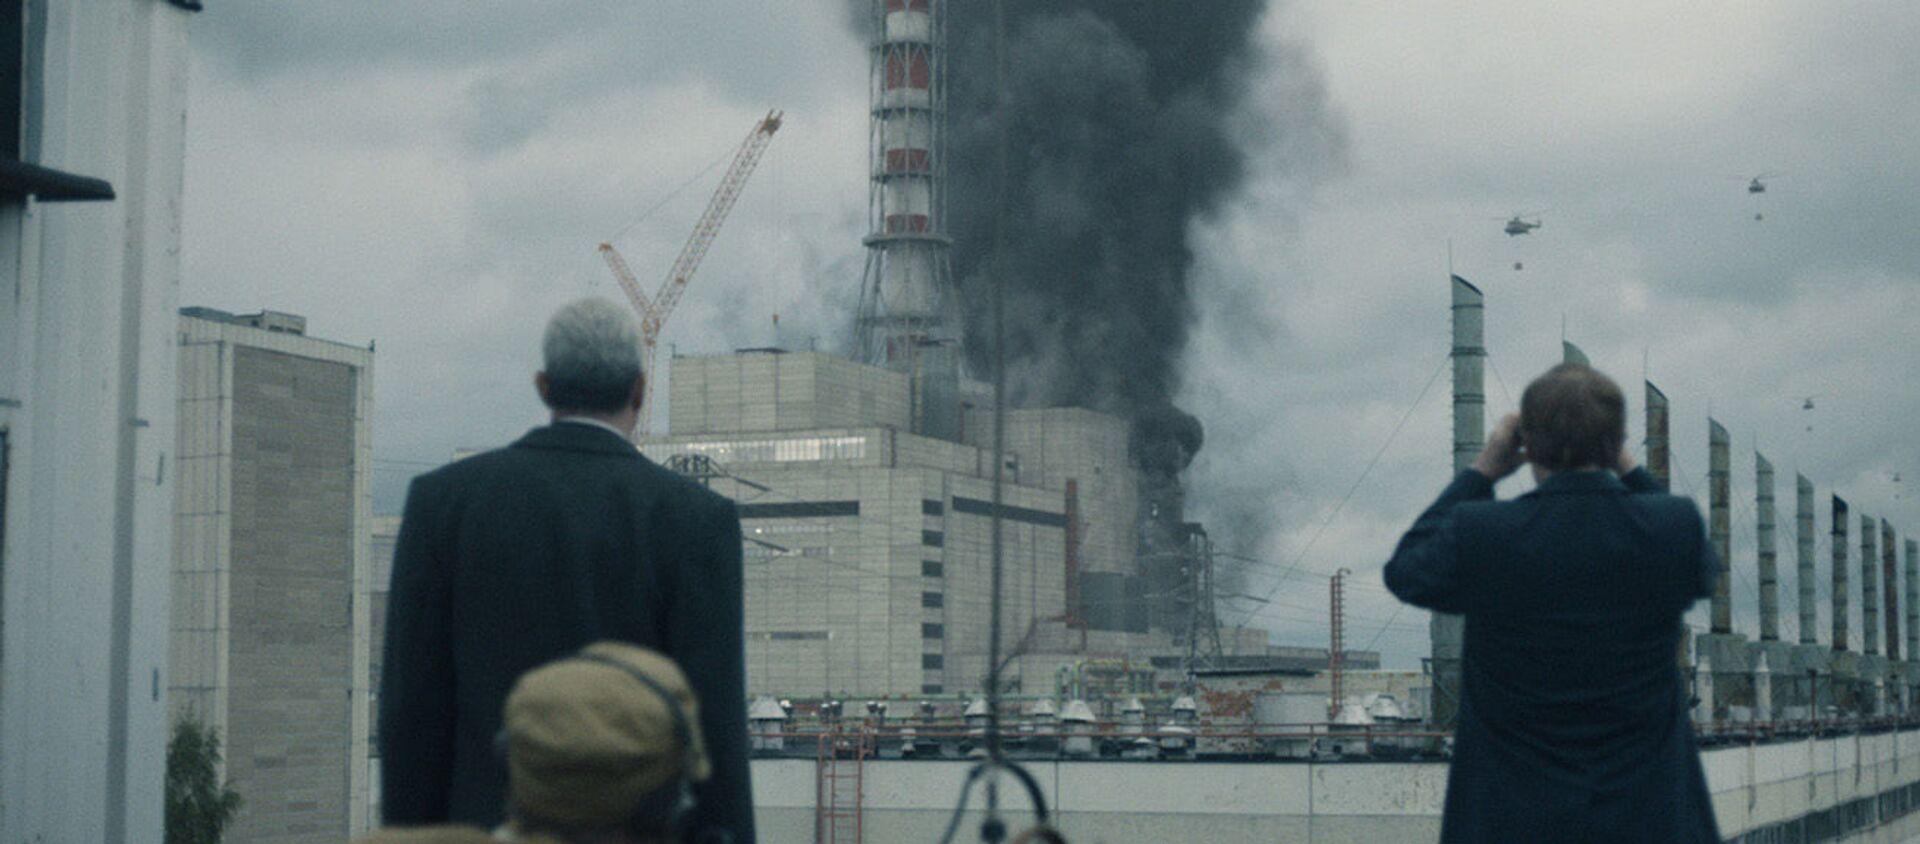 "Kadr z serialu ""Czarnobyl"" - Sputnik Polska, 1920, 24.06.2020"